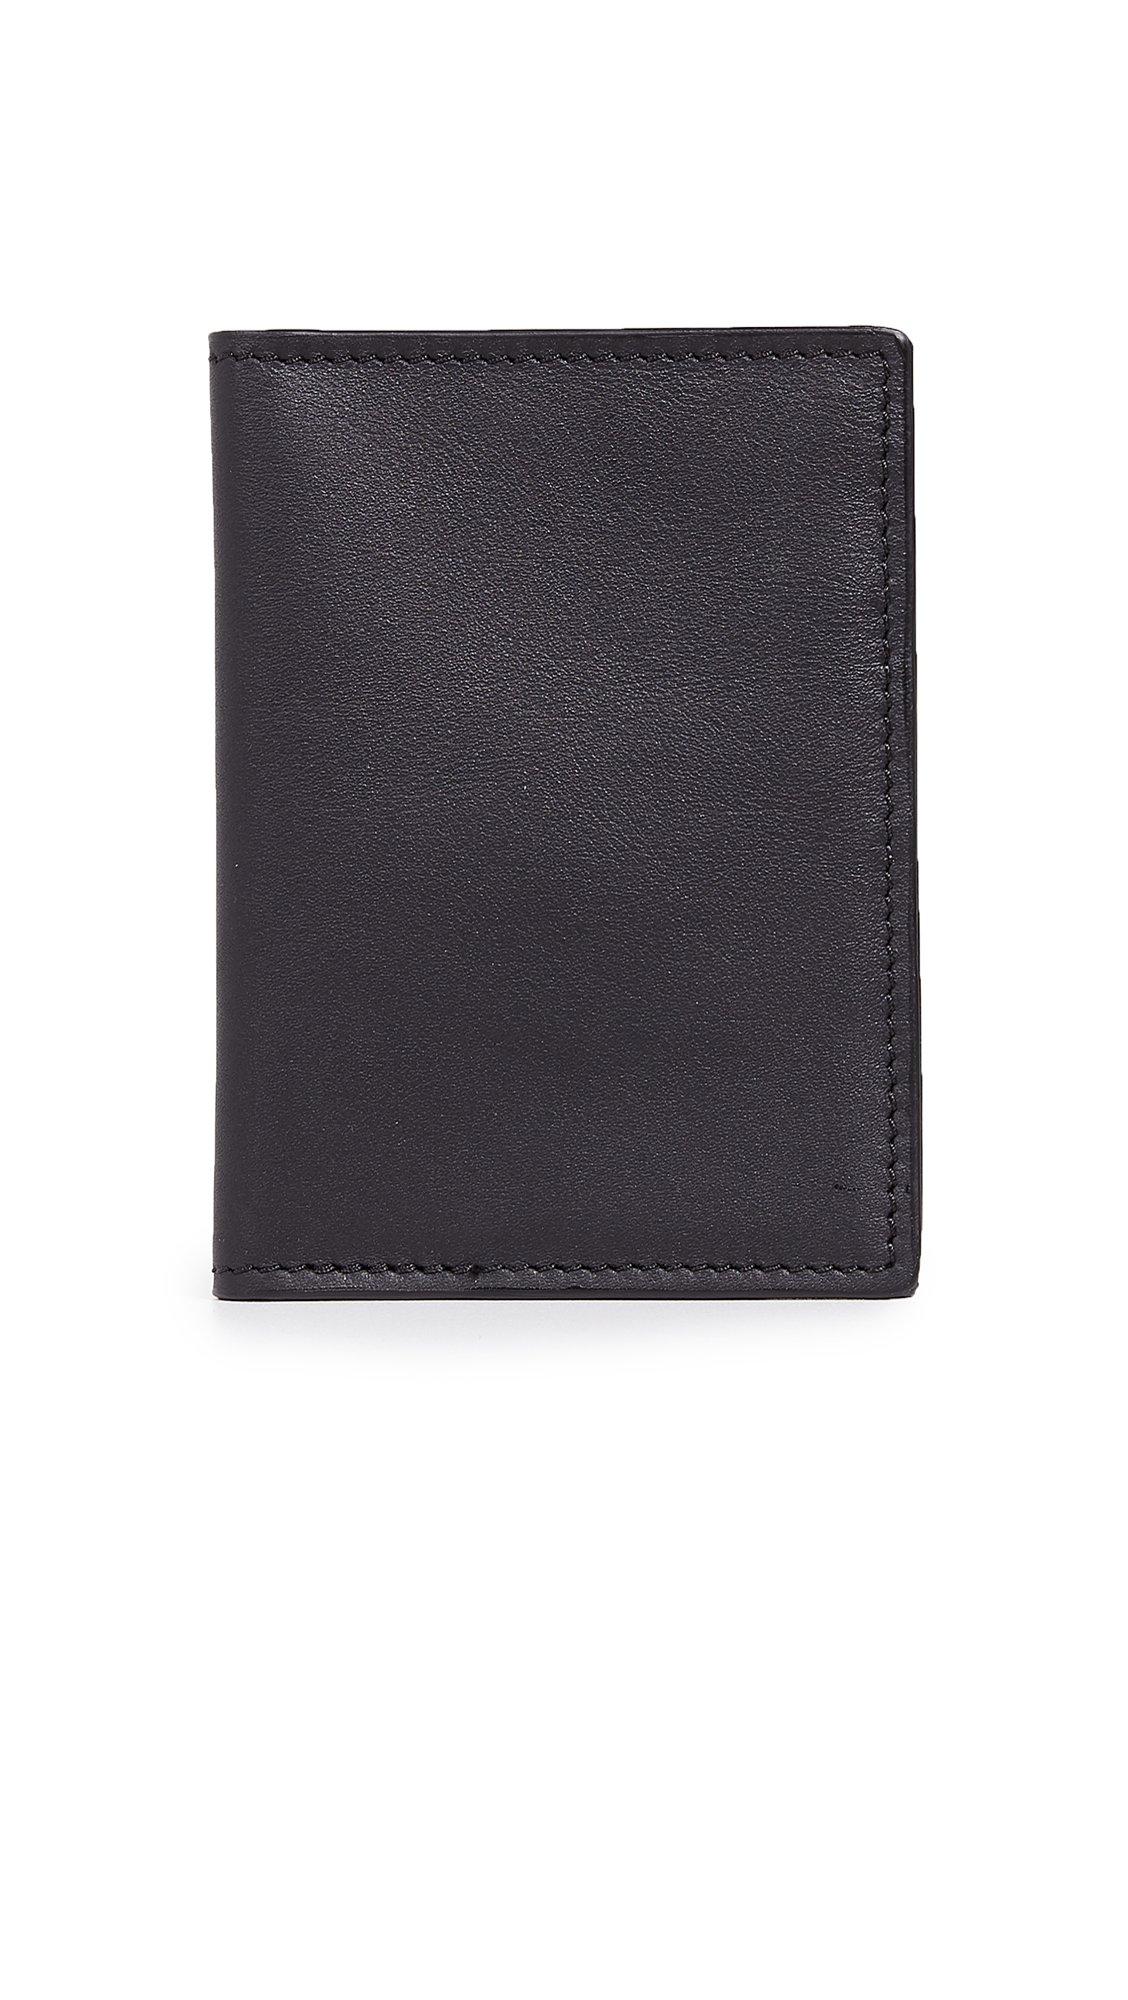 Shinola Men's Signature Passport Wallet, Black, One Size